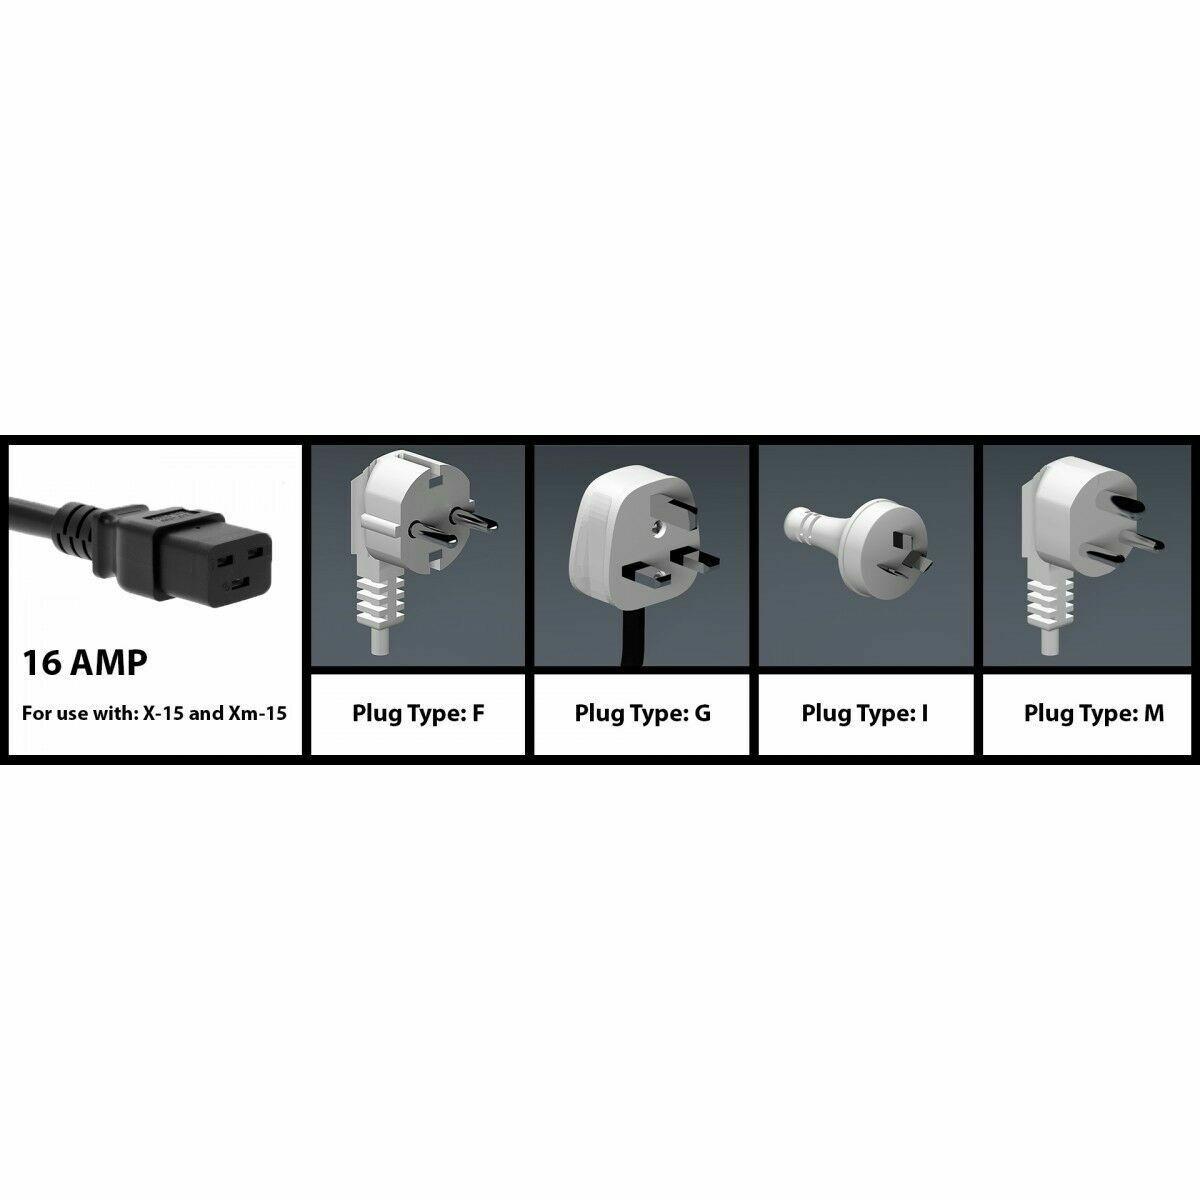 как выглядит PowerXchanger Xm-15 Installer Series SMART Voltage Frequency Converter фото